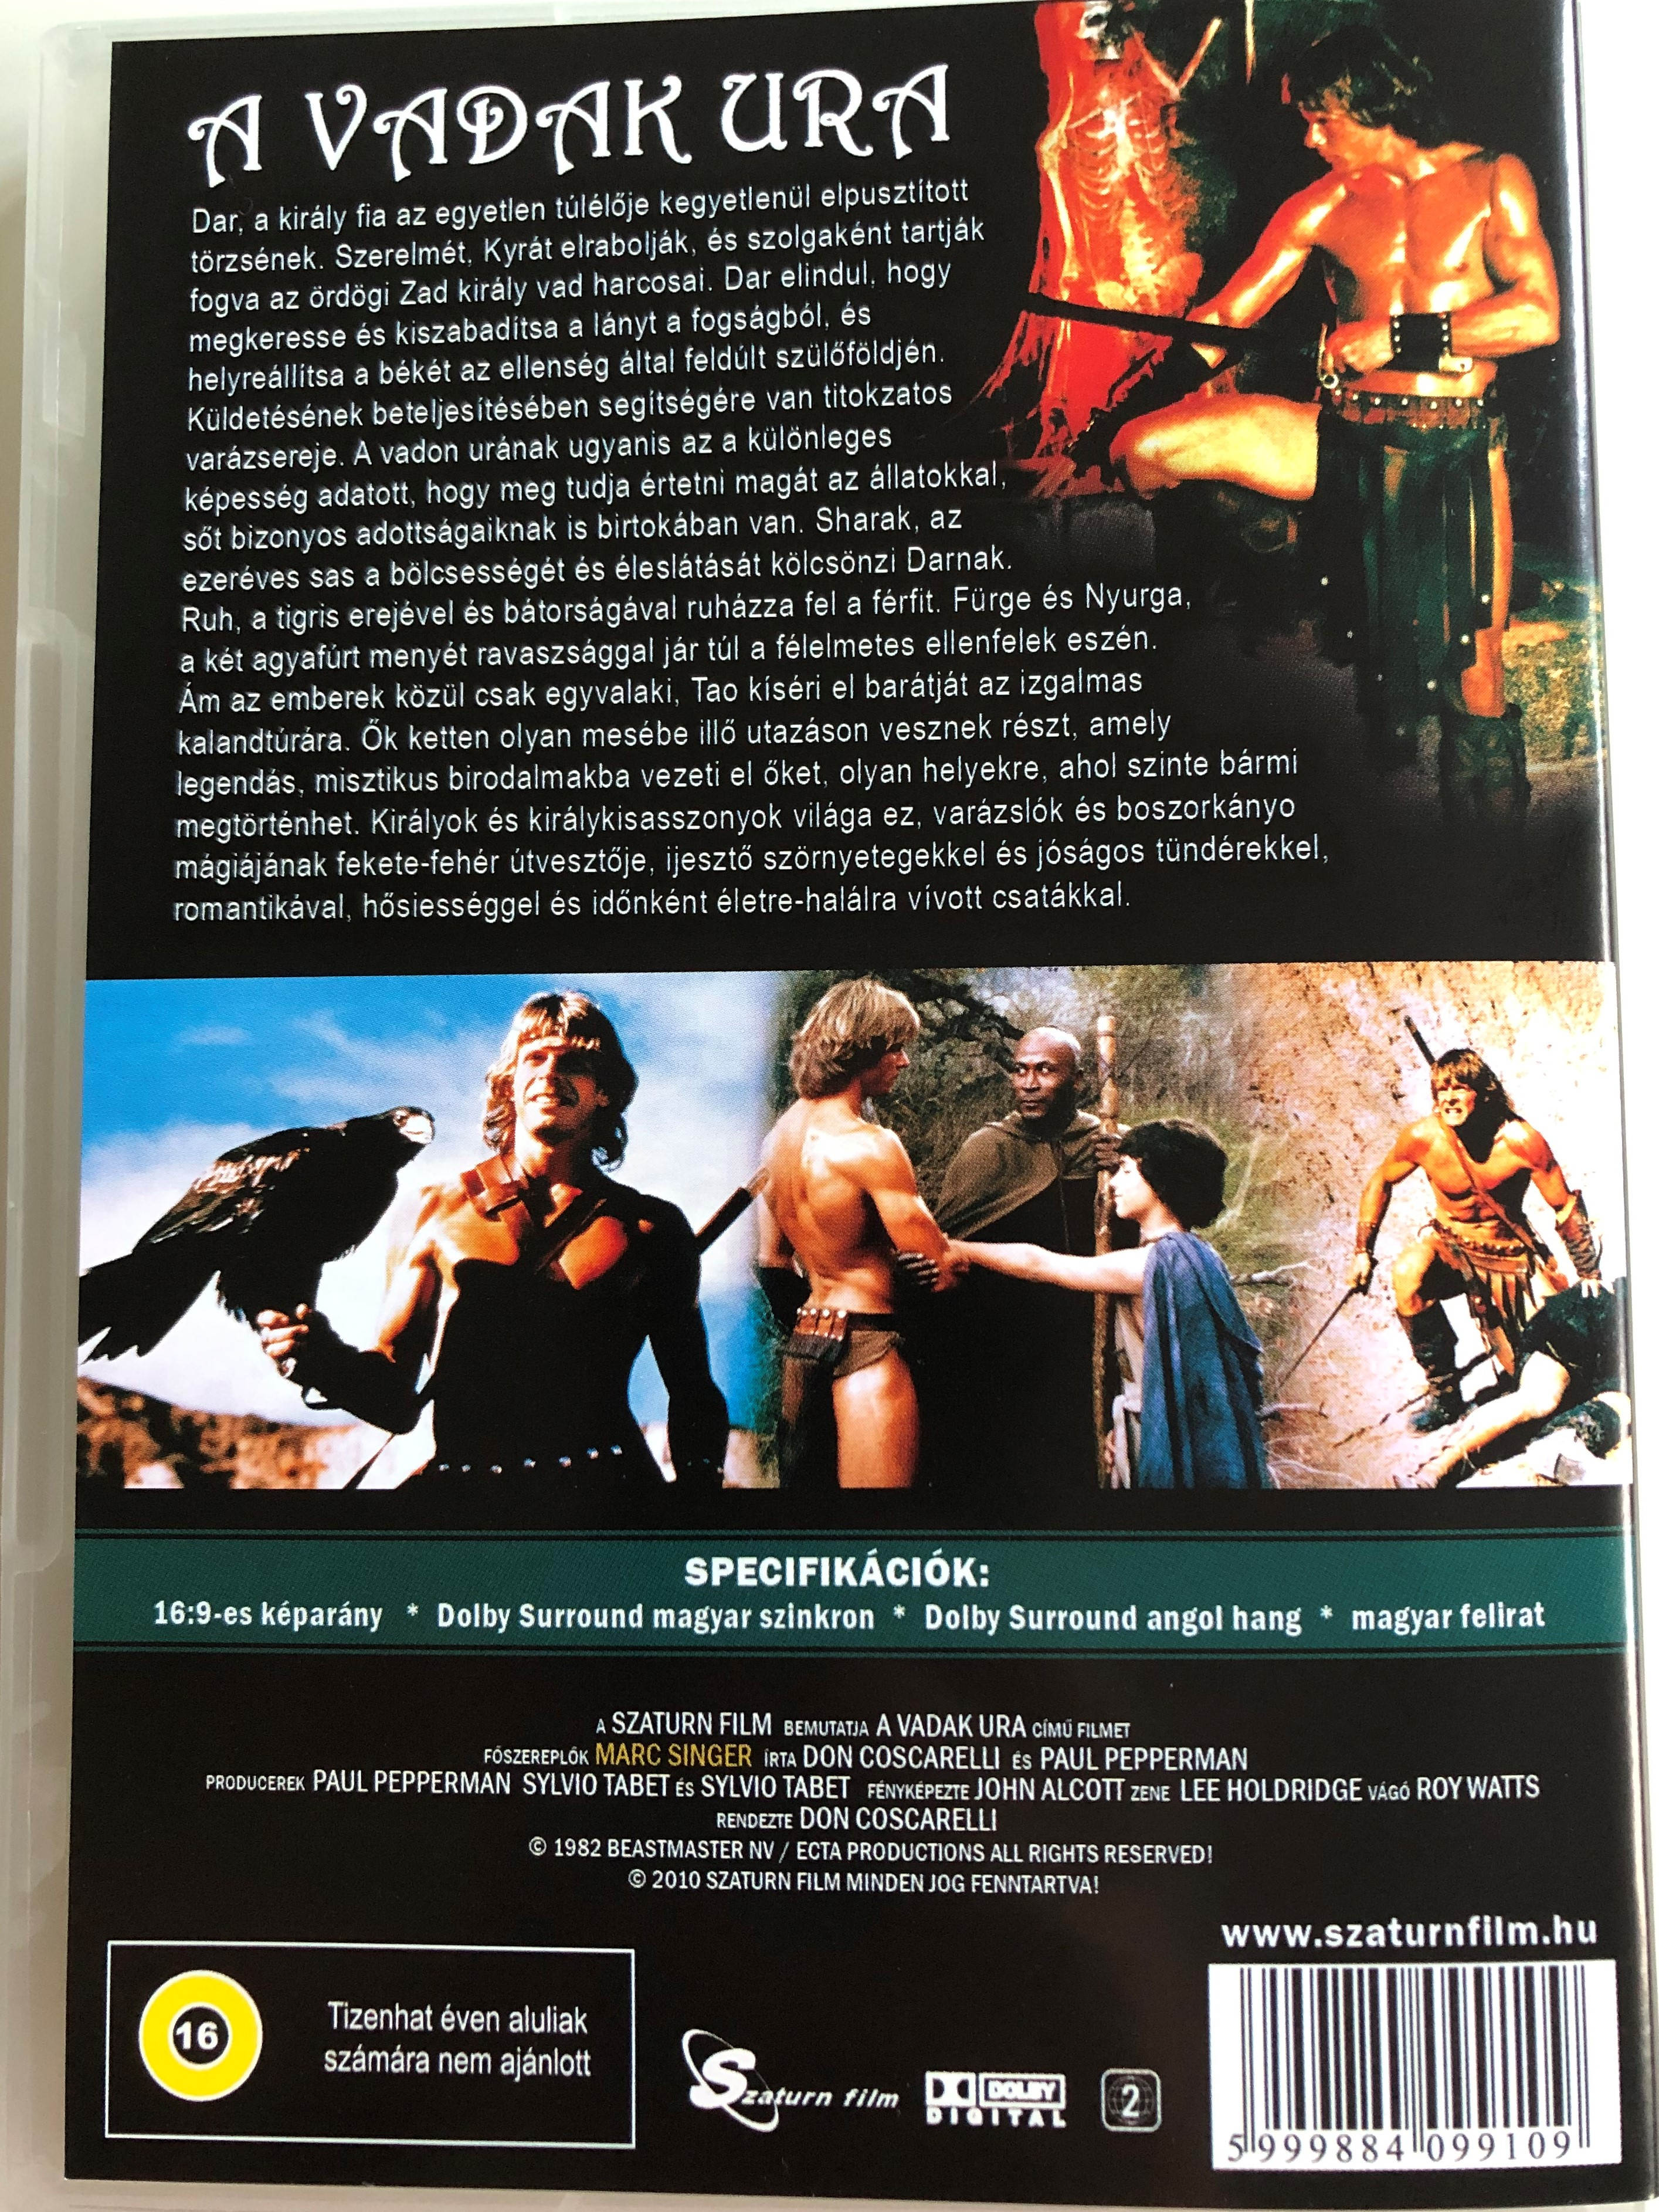 the-beastmaster-dvd-1982-a-vadak-ura-directed-by-don-coscarelli-2.jpg